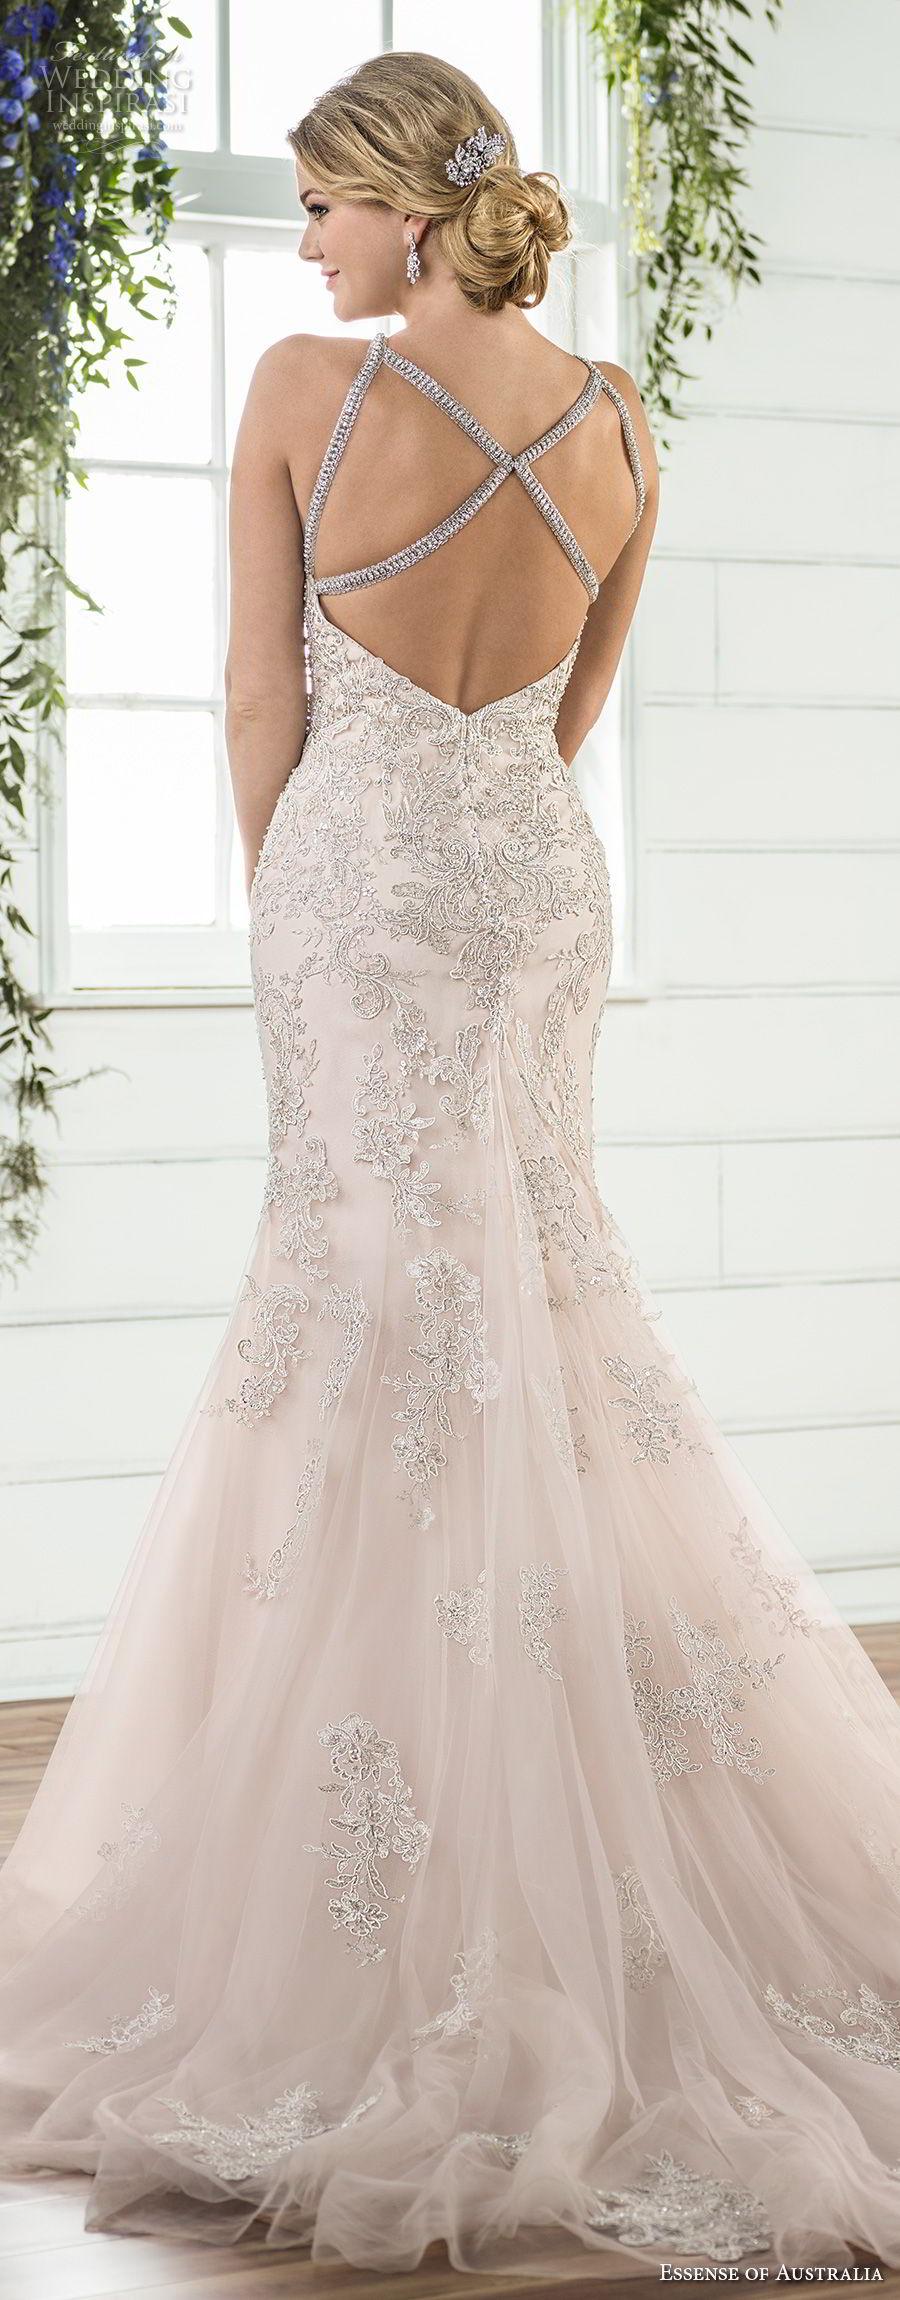 essense wedding dresses photo - 1